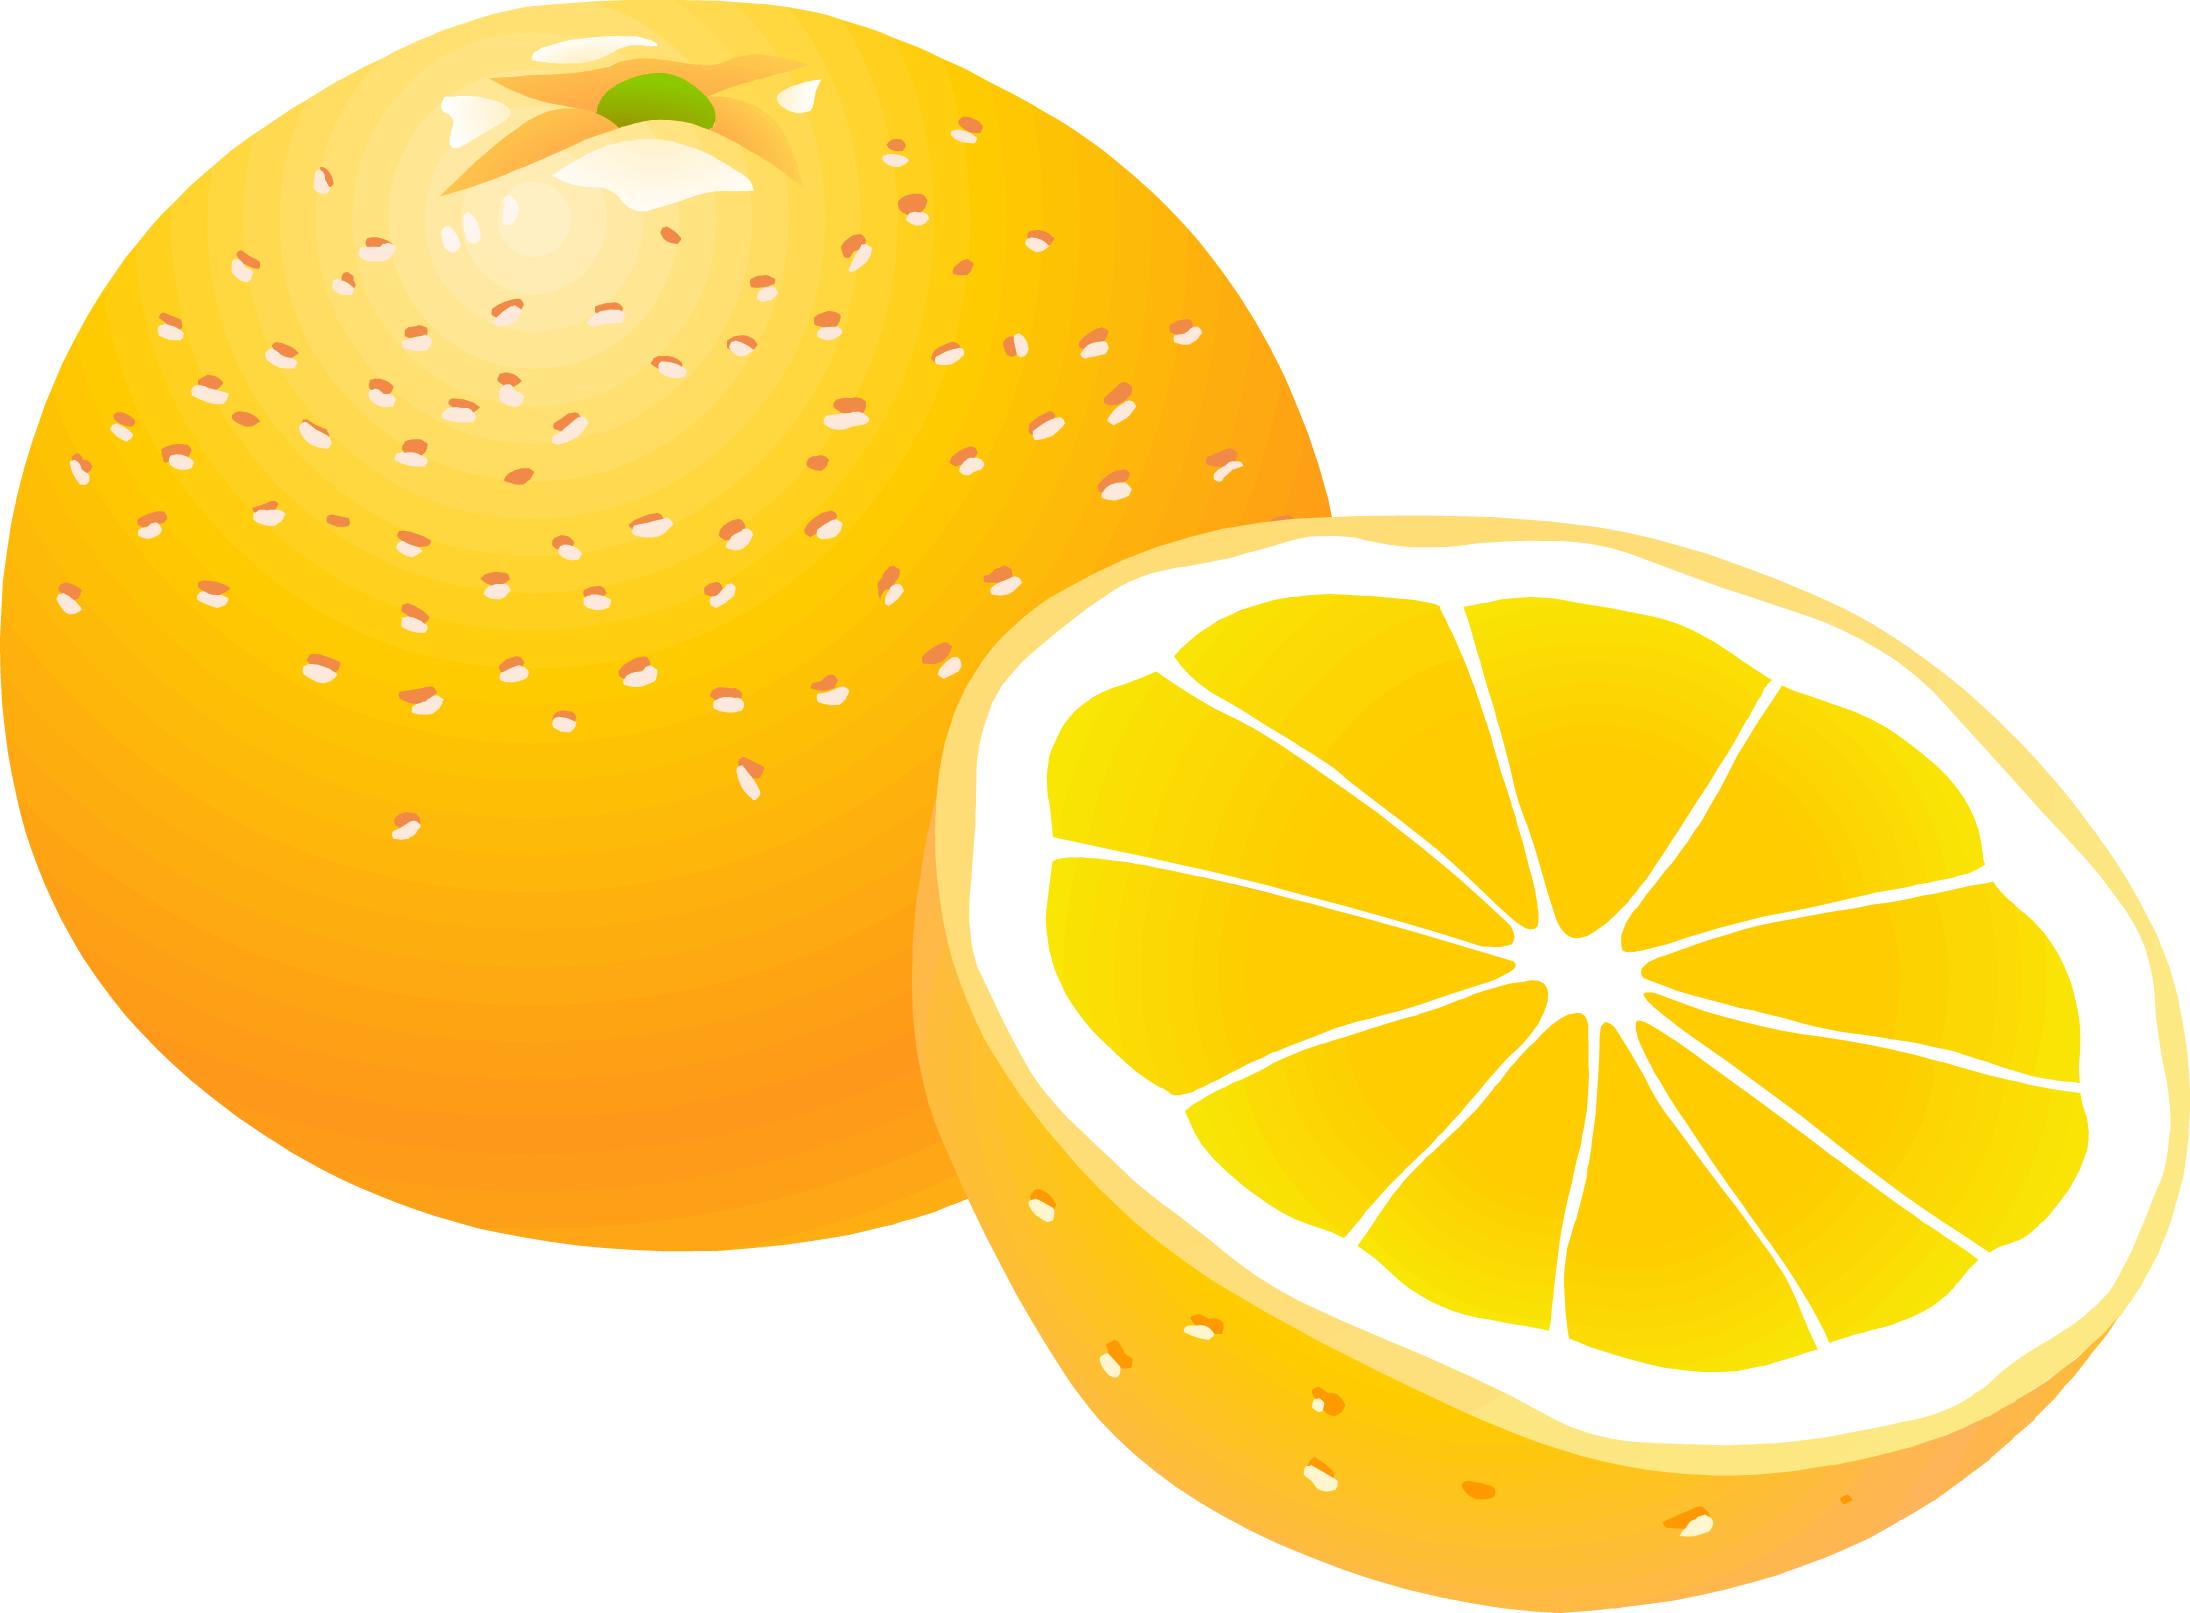 Image category: Oranges Orange Moon Clipart